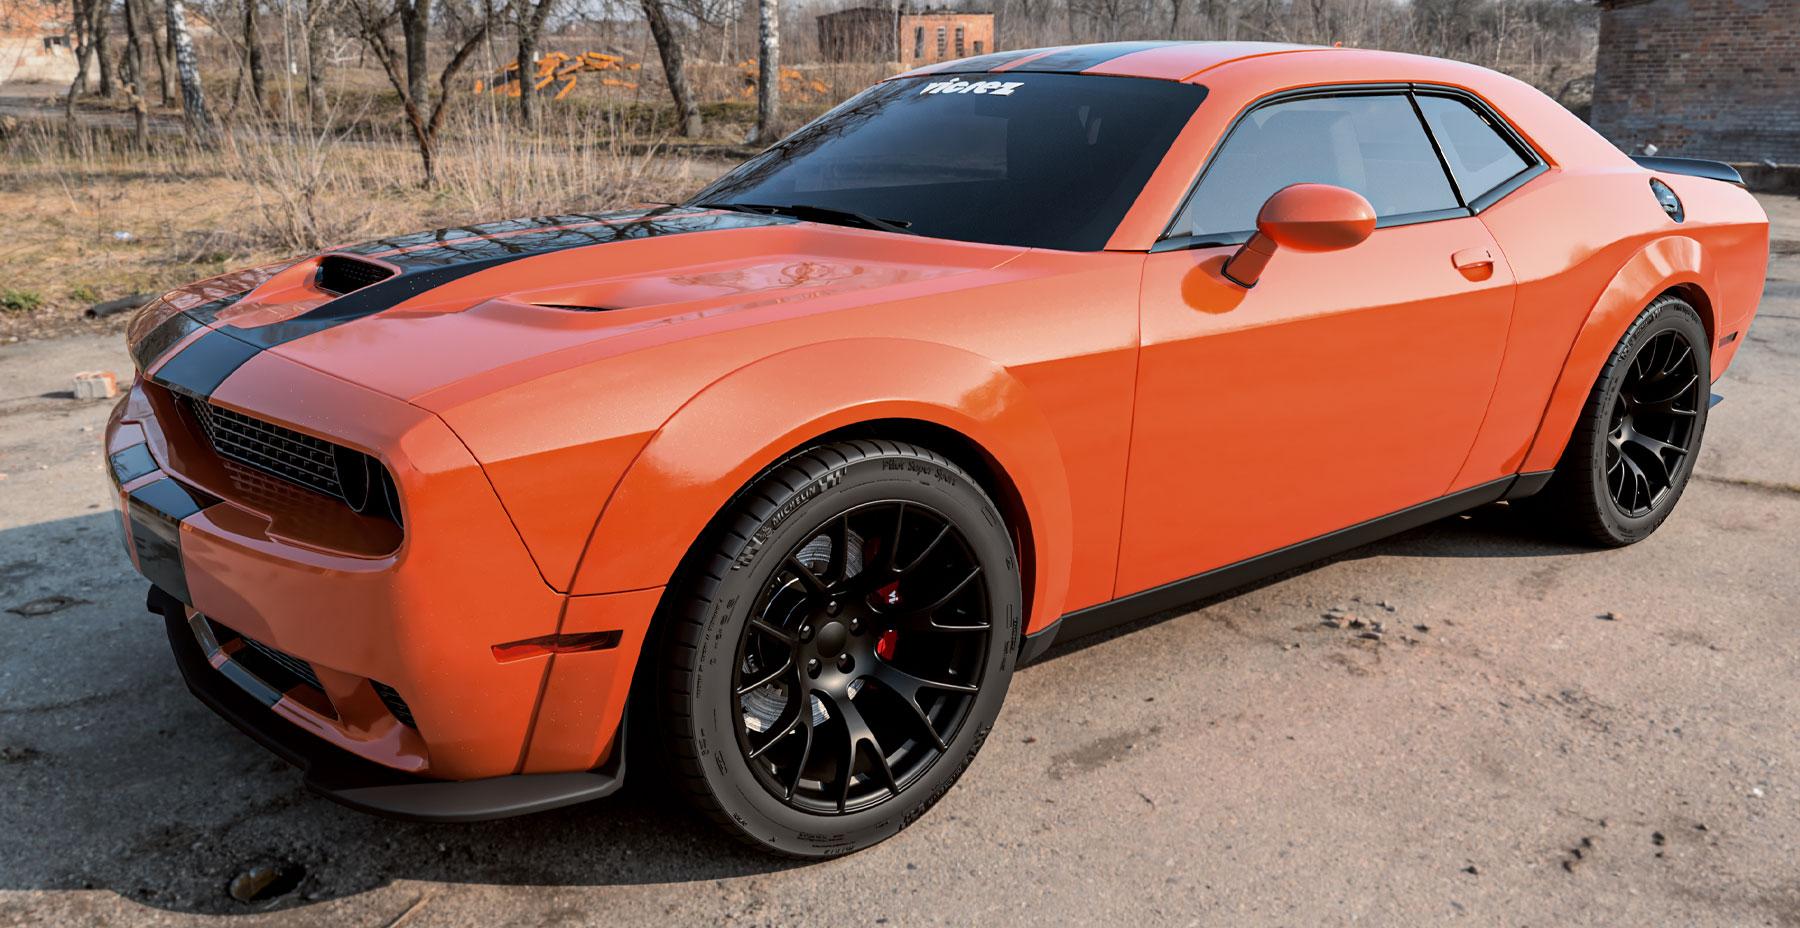 Orange Dodge Challenger Widebody x Hellcat Style Widebody Matte Black Wheel